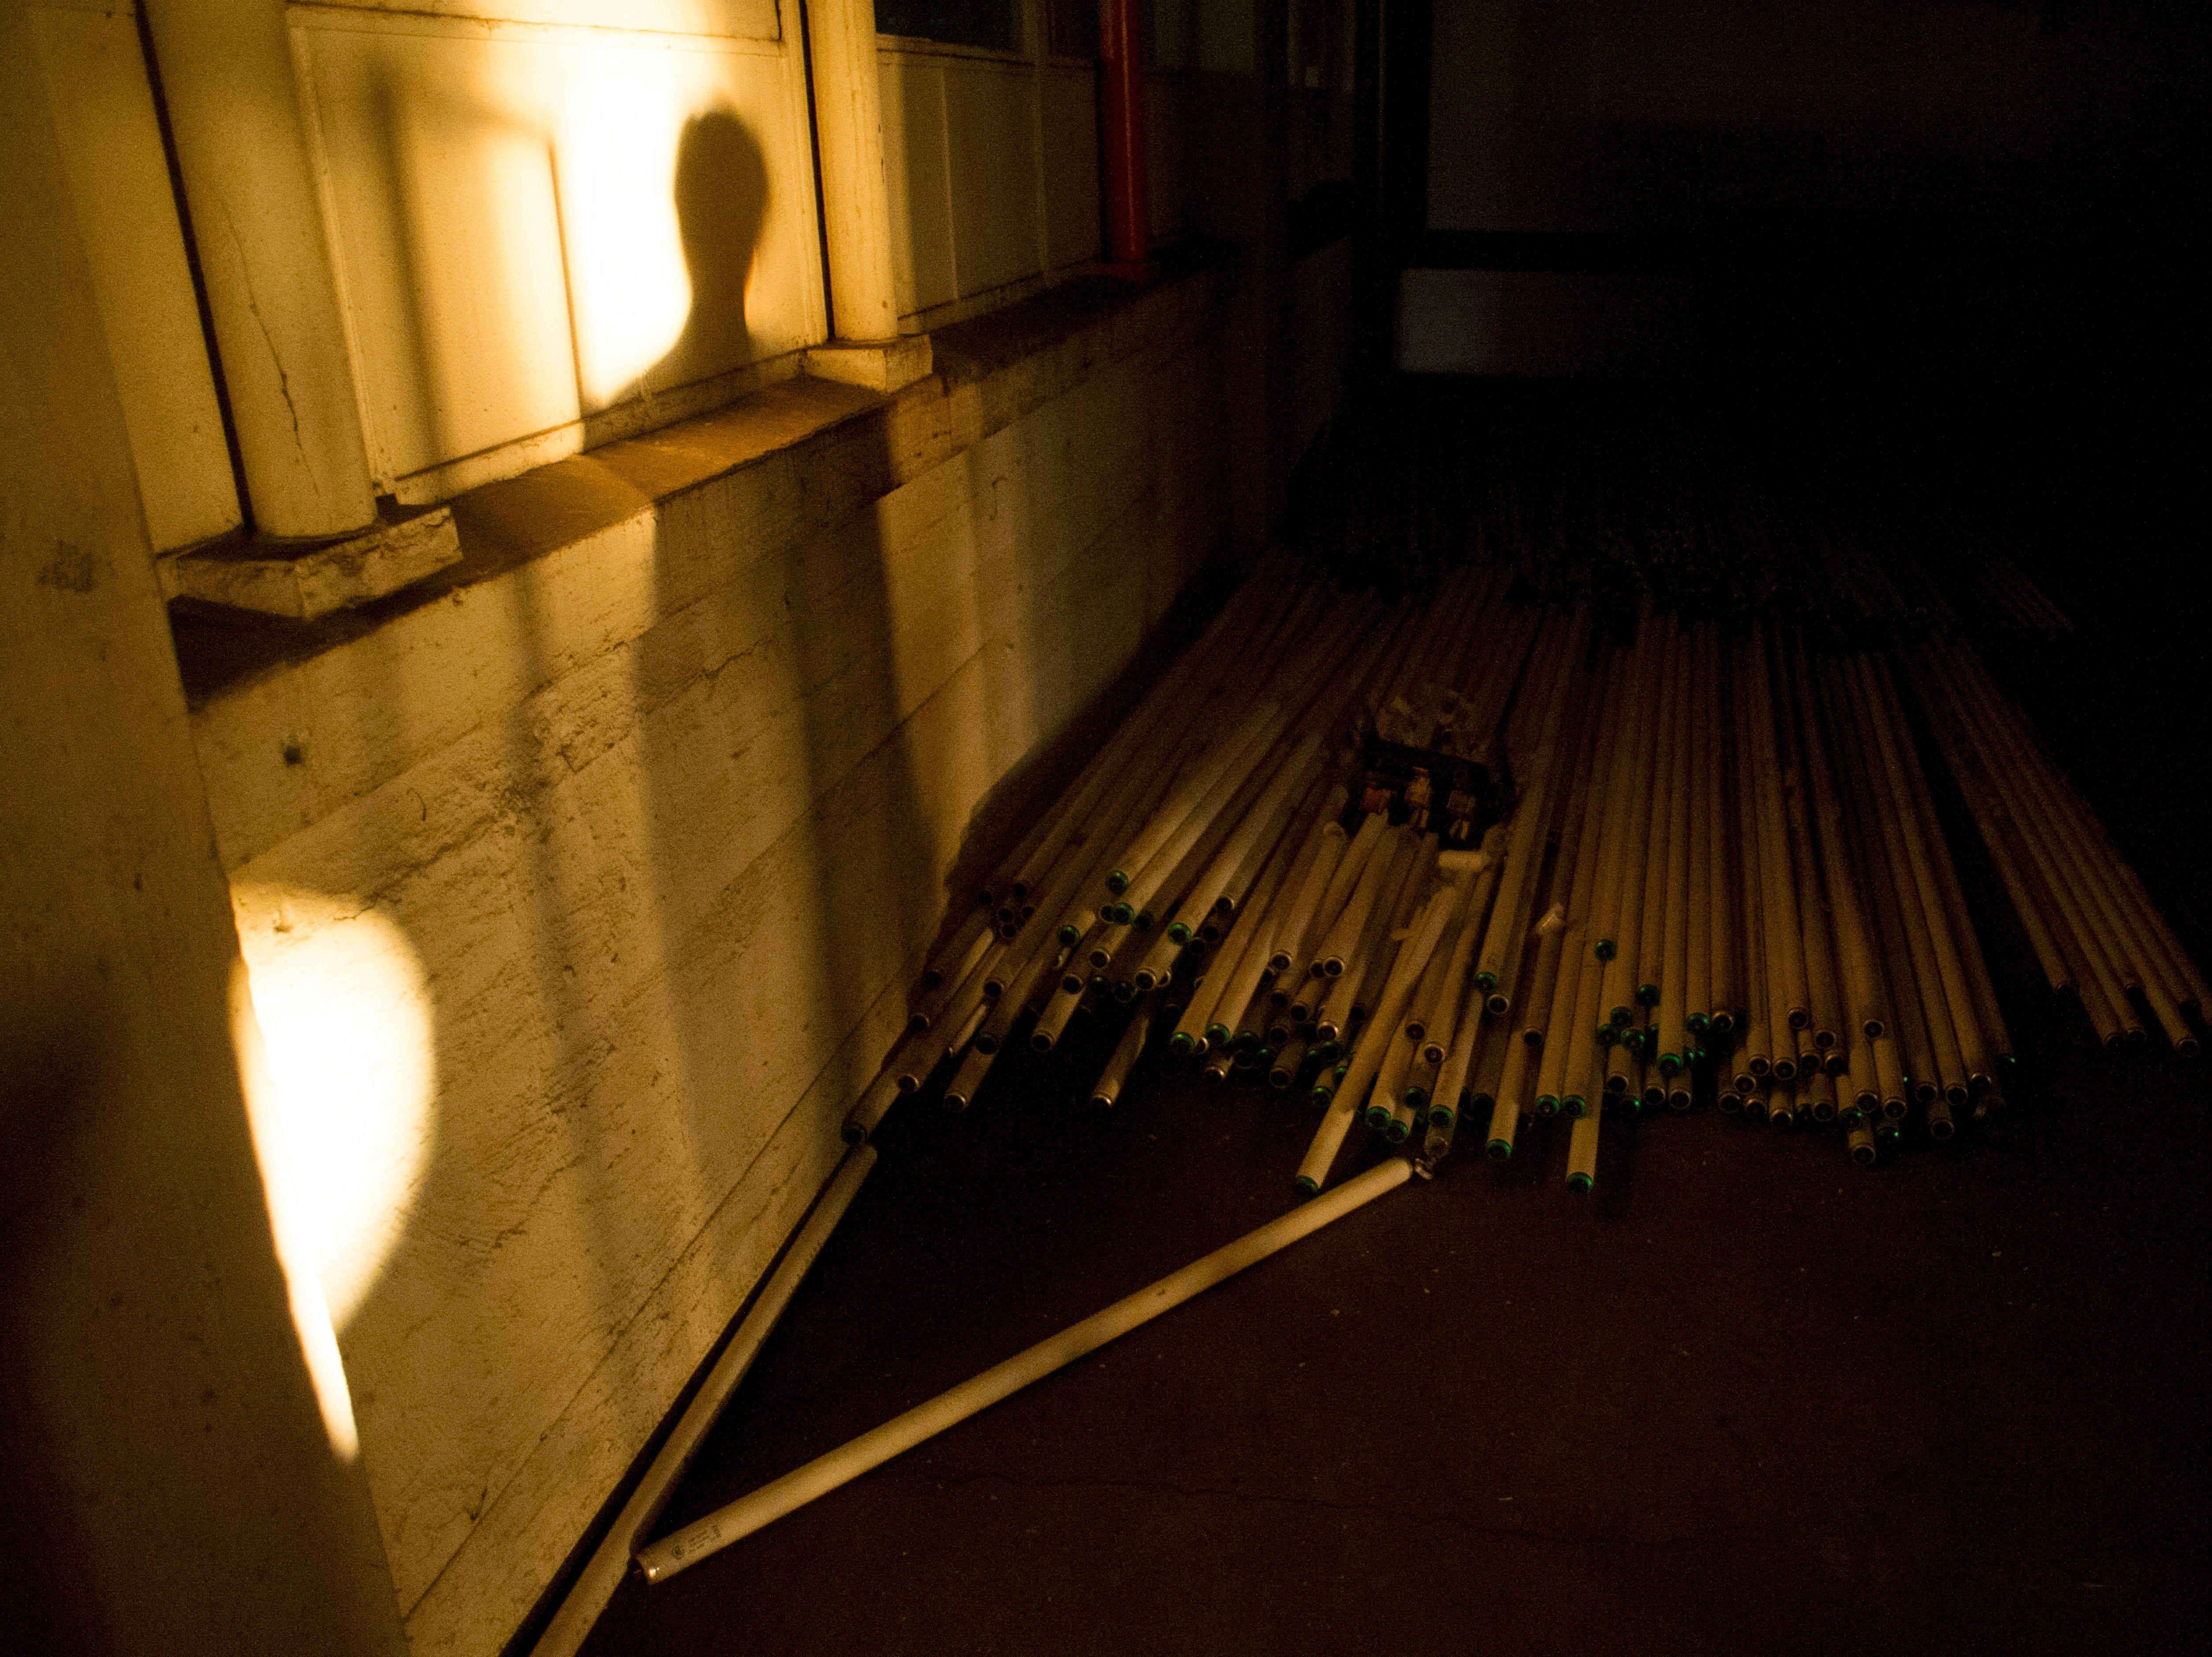 Fluorescent light tubes stored in a room at the Standard Knitting Mill building on Thursday, November 15, 2012.